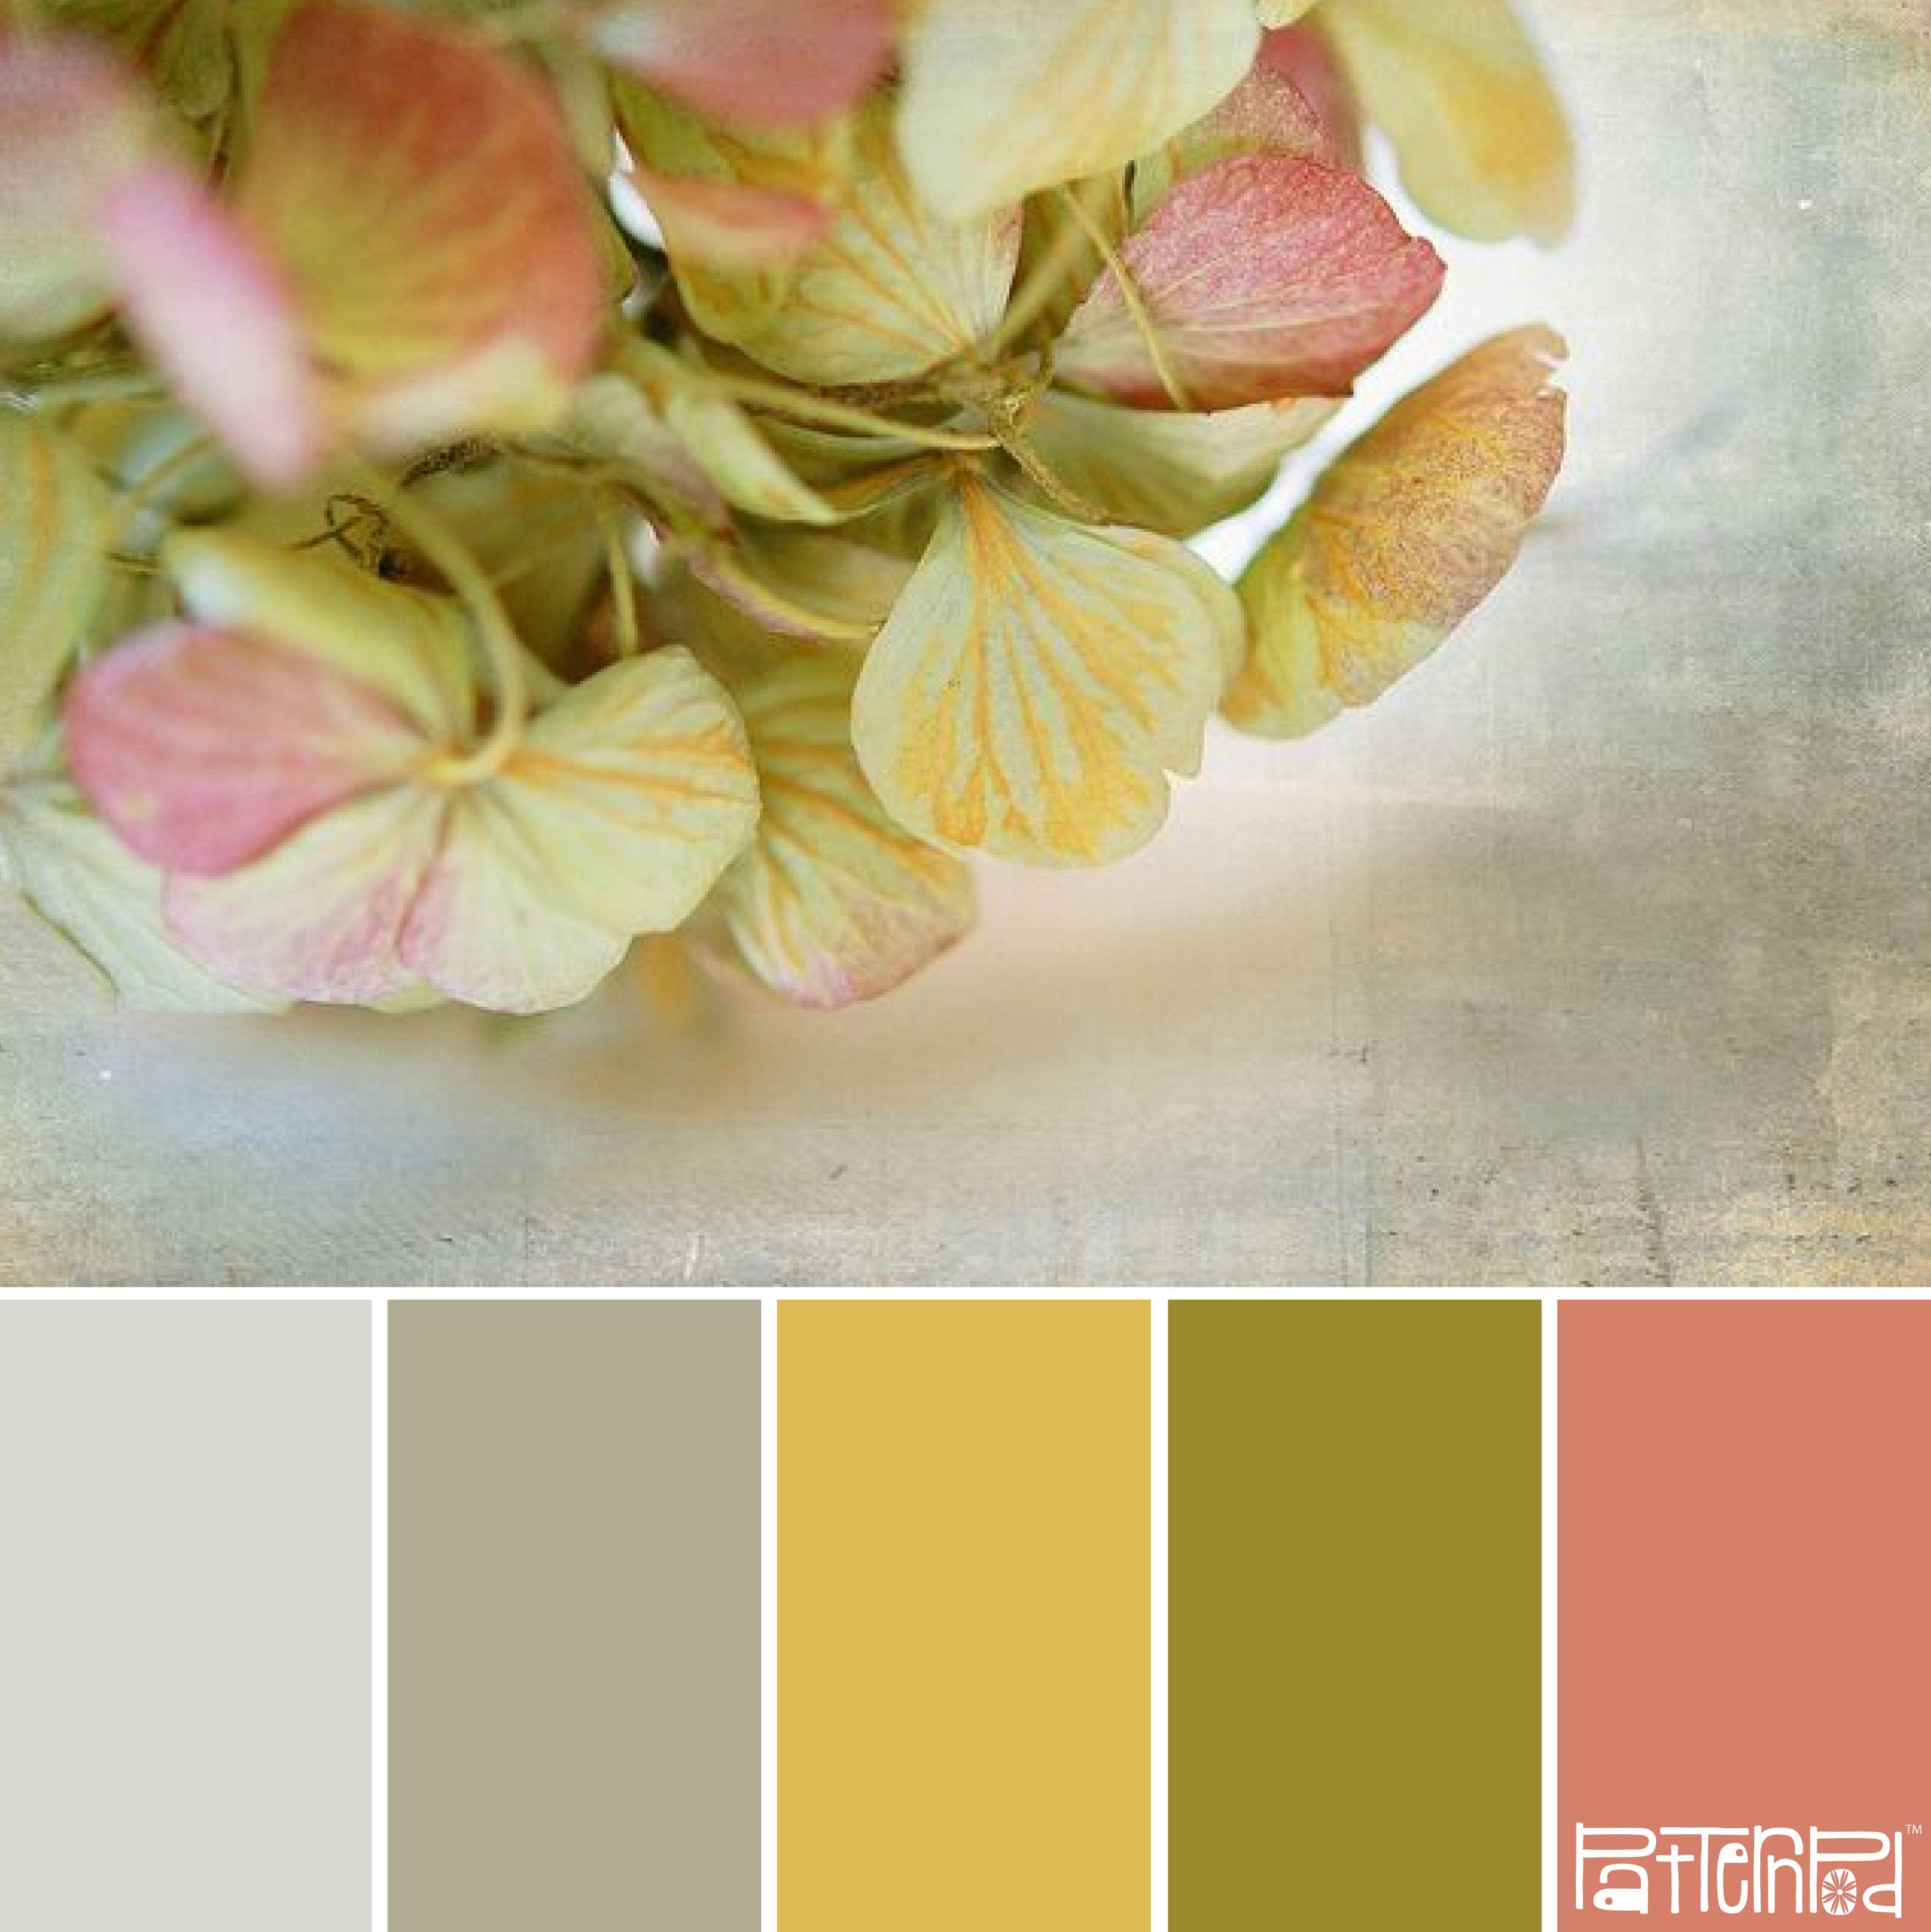 Such Gorgeous Colors And Softness: Tonos Y Colores